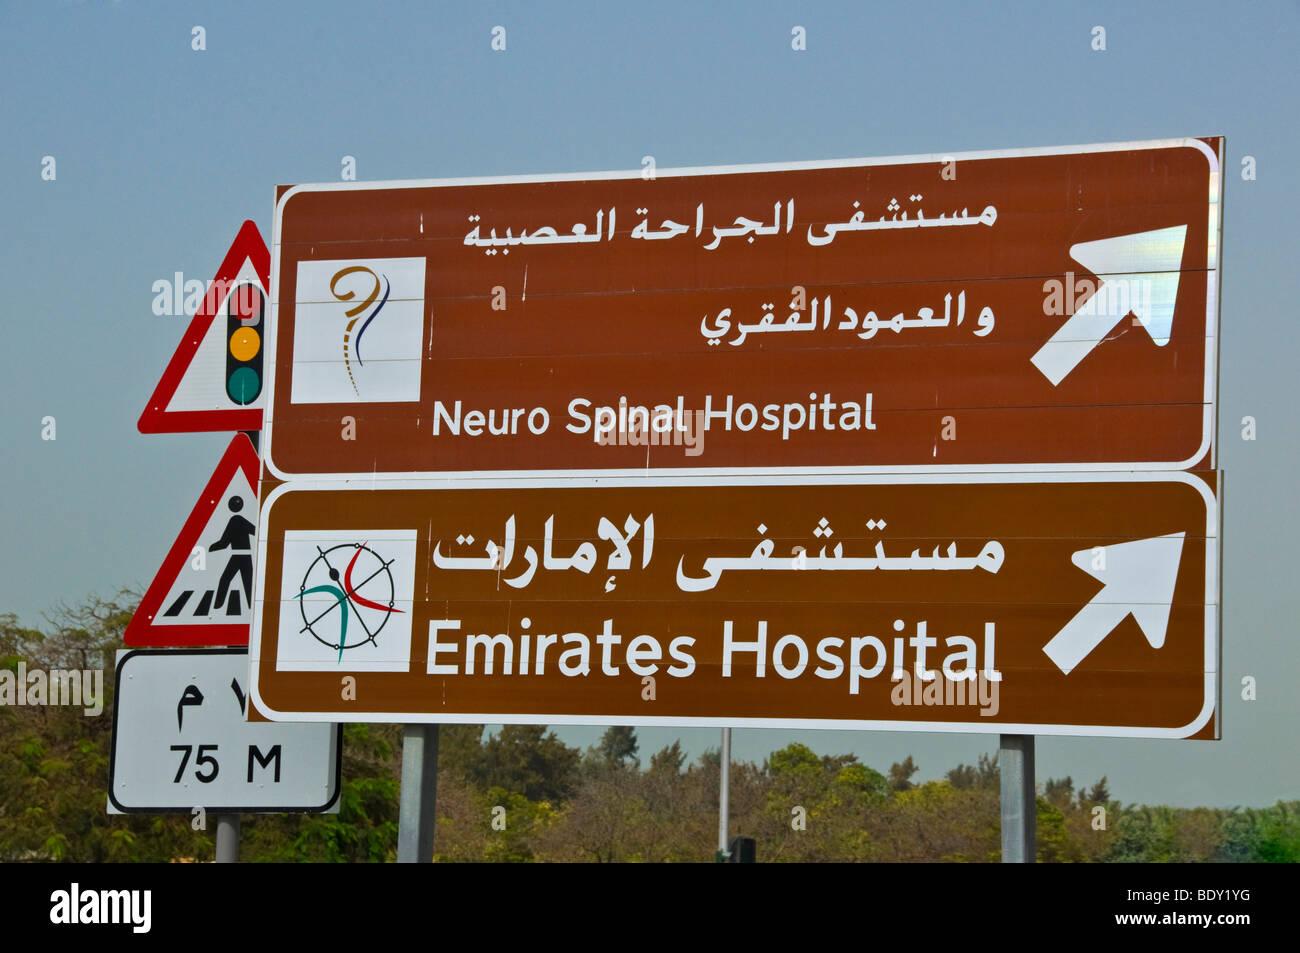 Indications for a hospital Dubai - Stock Image